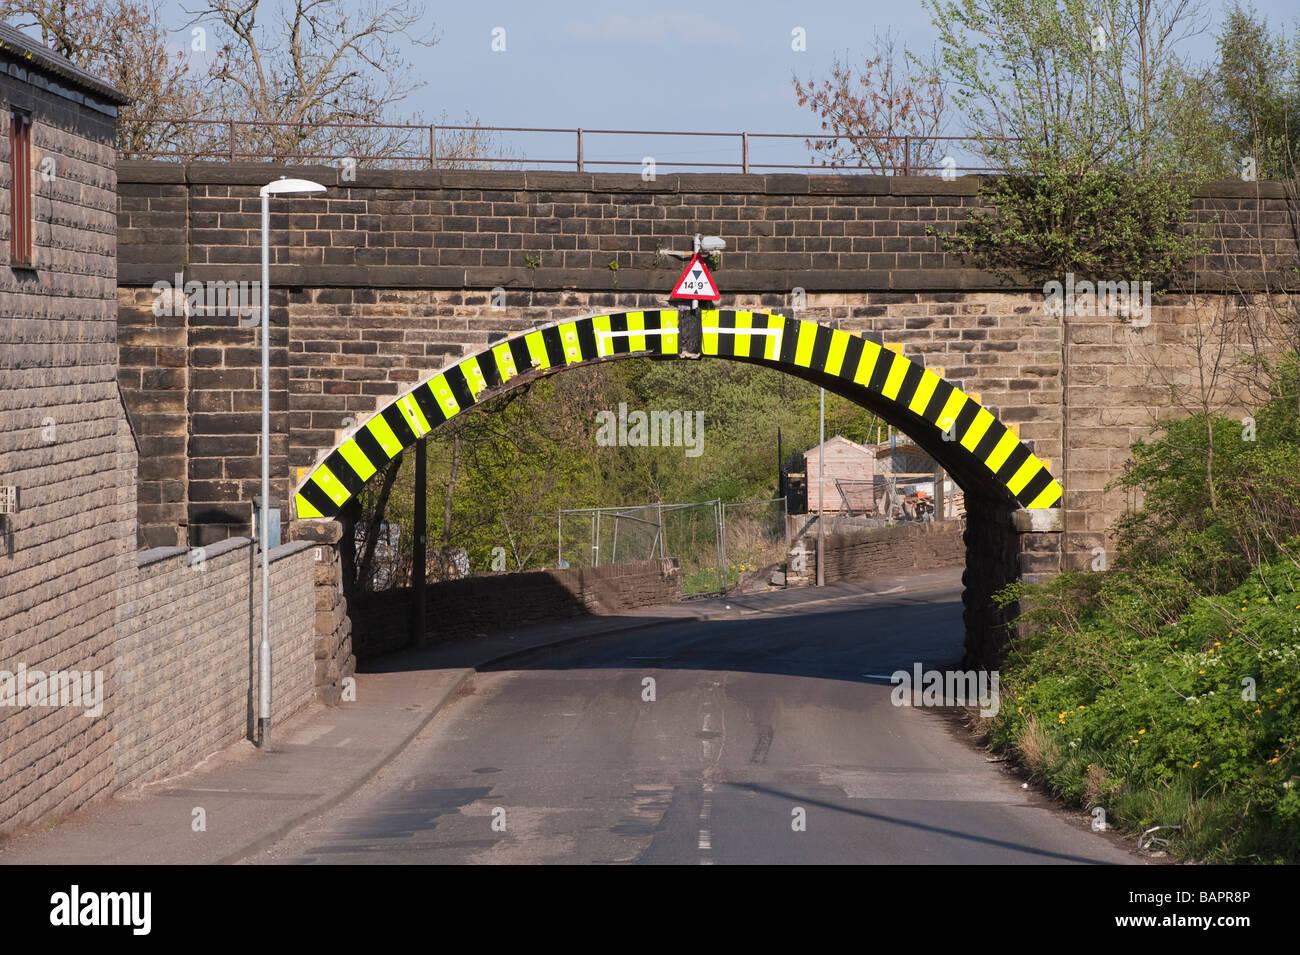 Low roadbridge with yellow and black striped warning markings - Stock Image